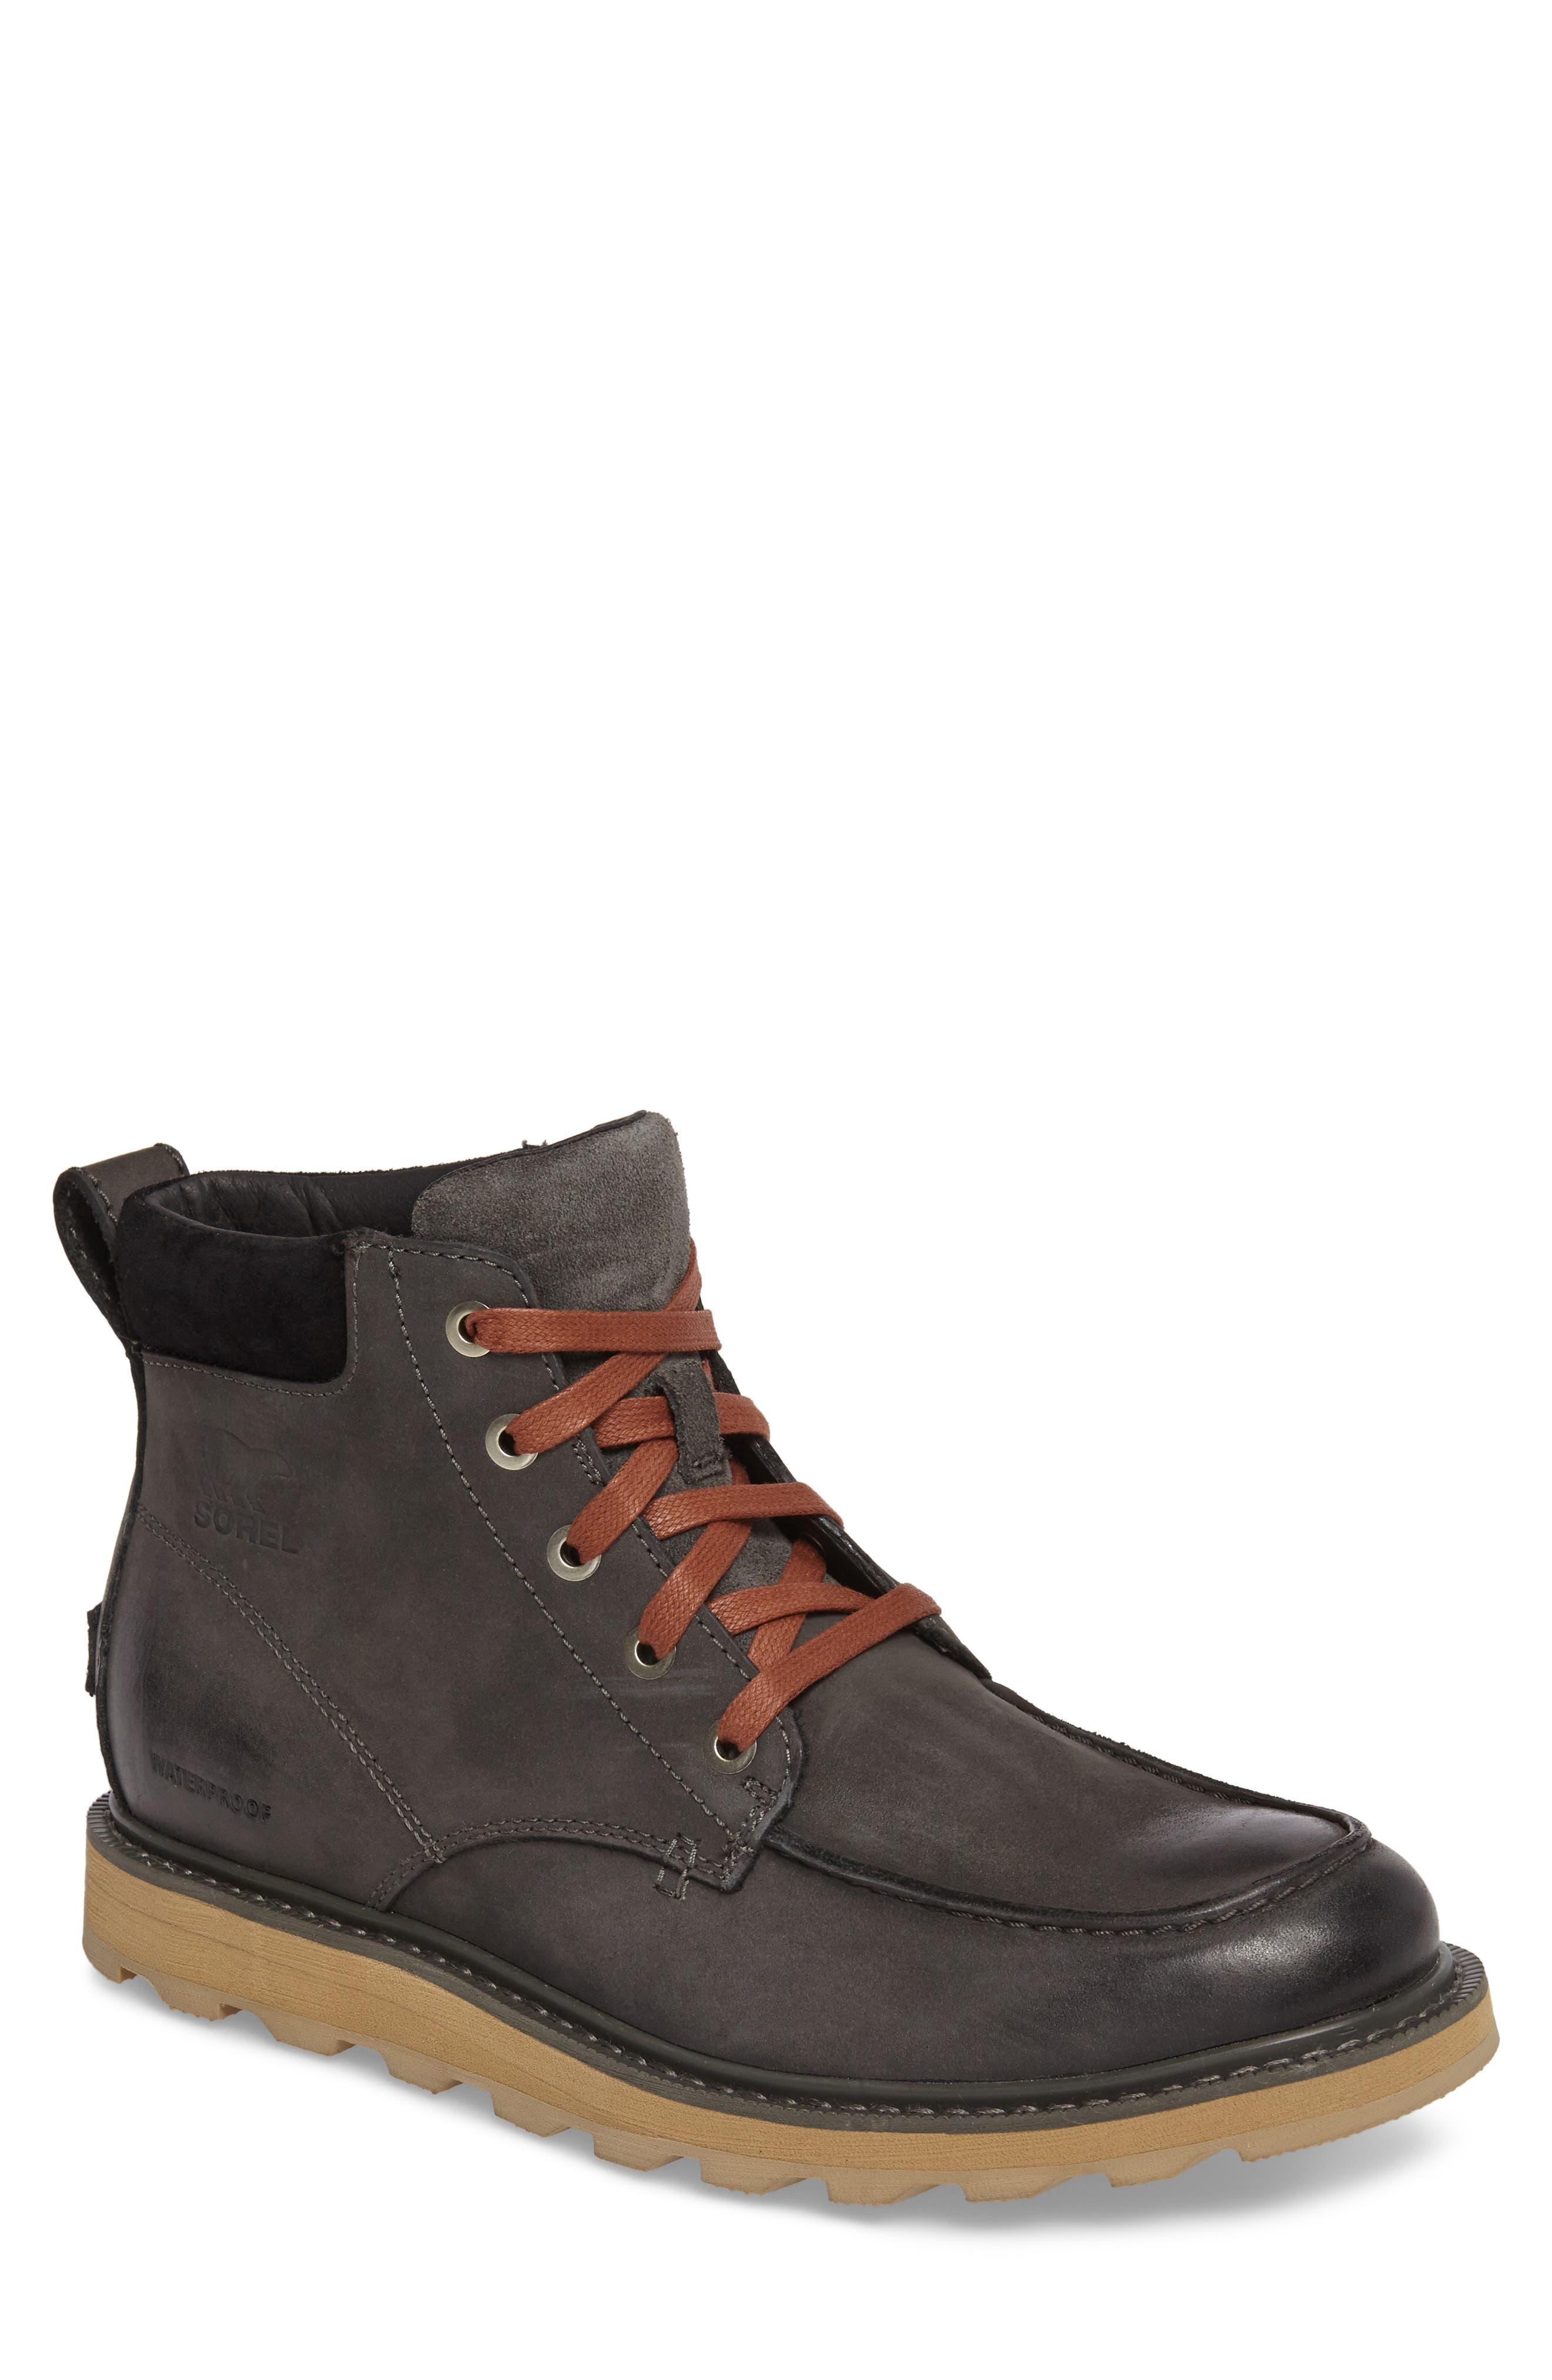 Alternate Image 1 Selected - Sorel Madson Moc Toe Boot (Men)